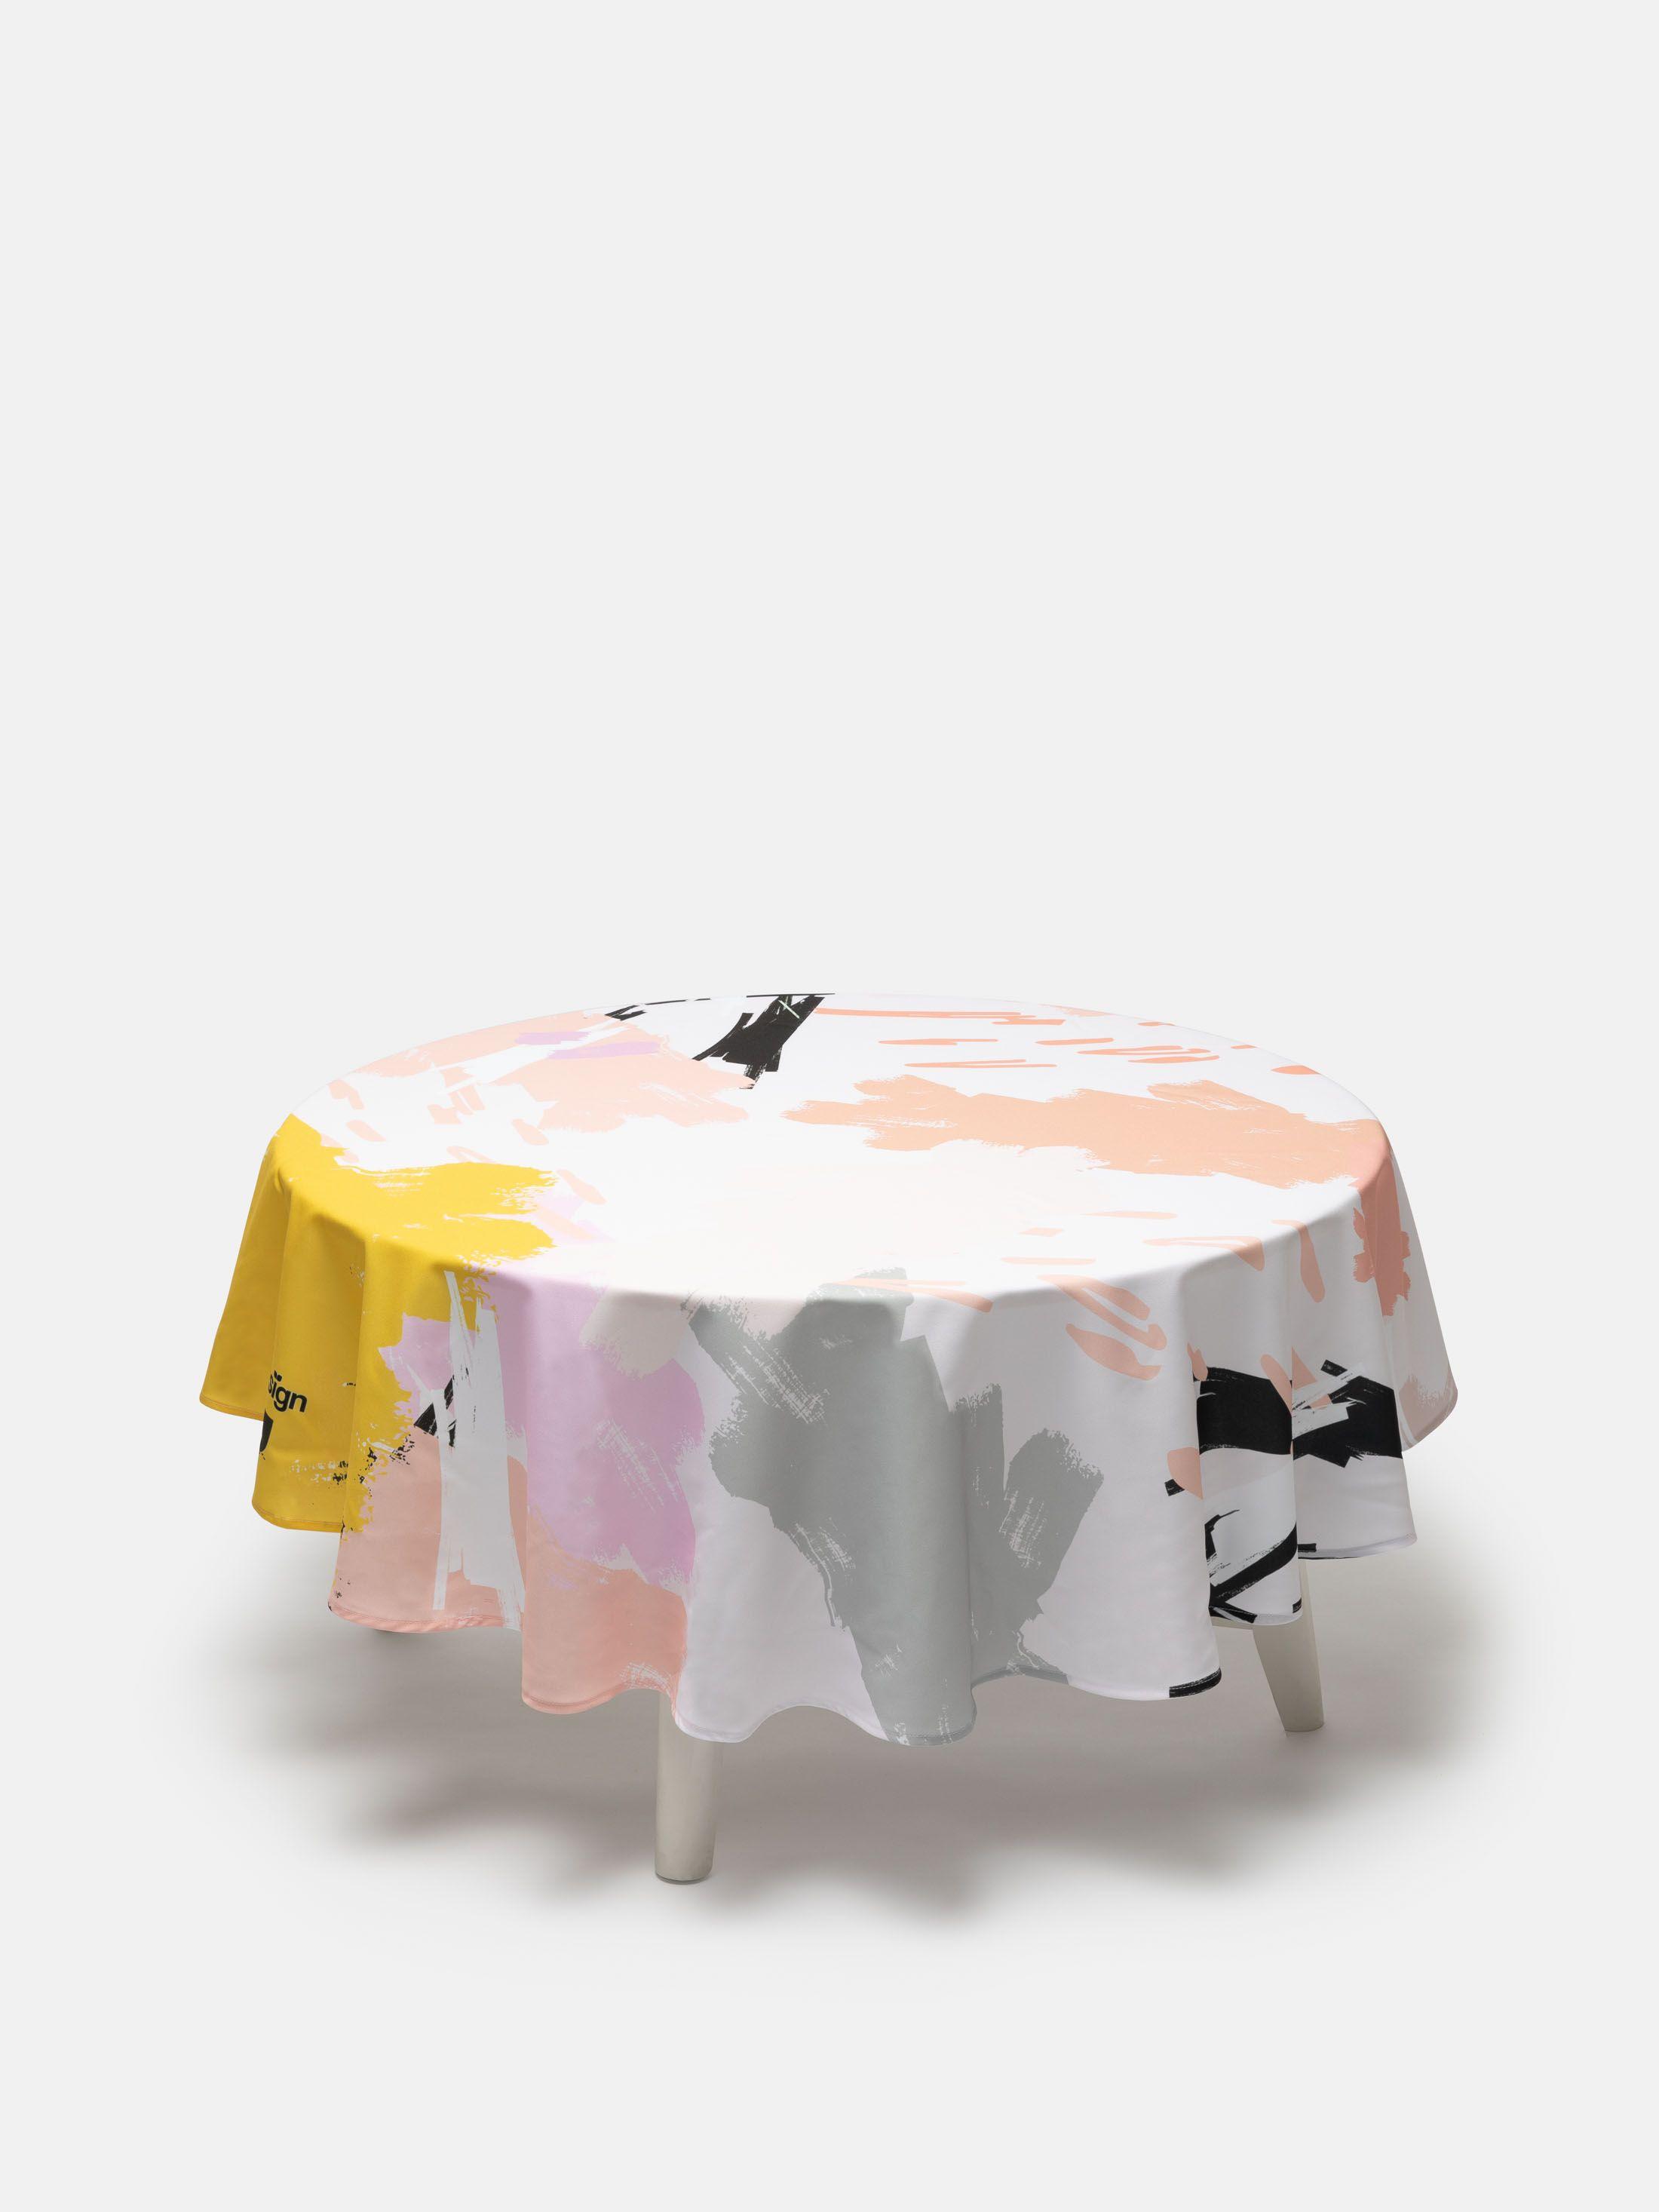 custom table cloth design